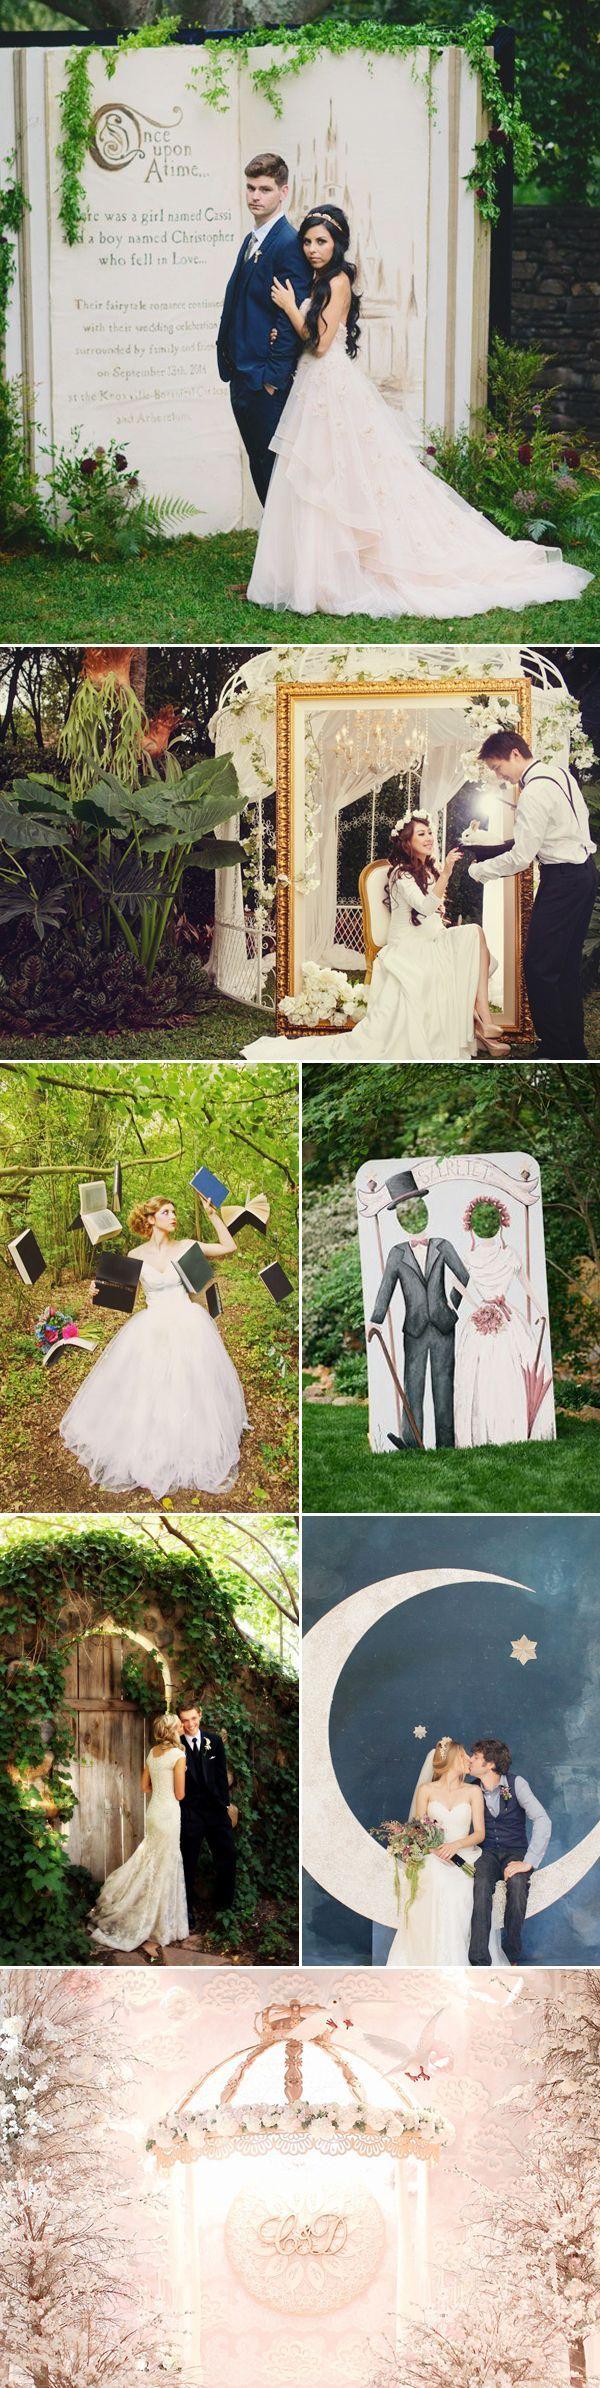 Best weddings images on pinterest weddings flower arrangements